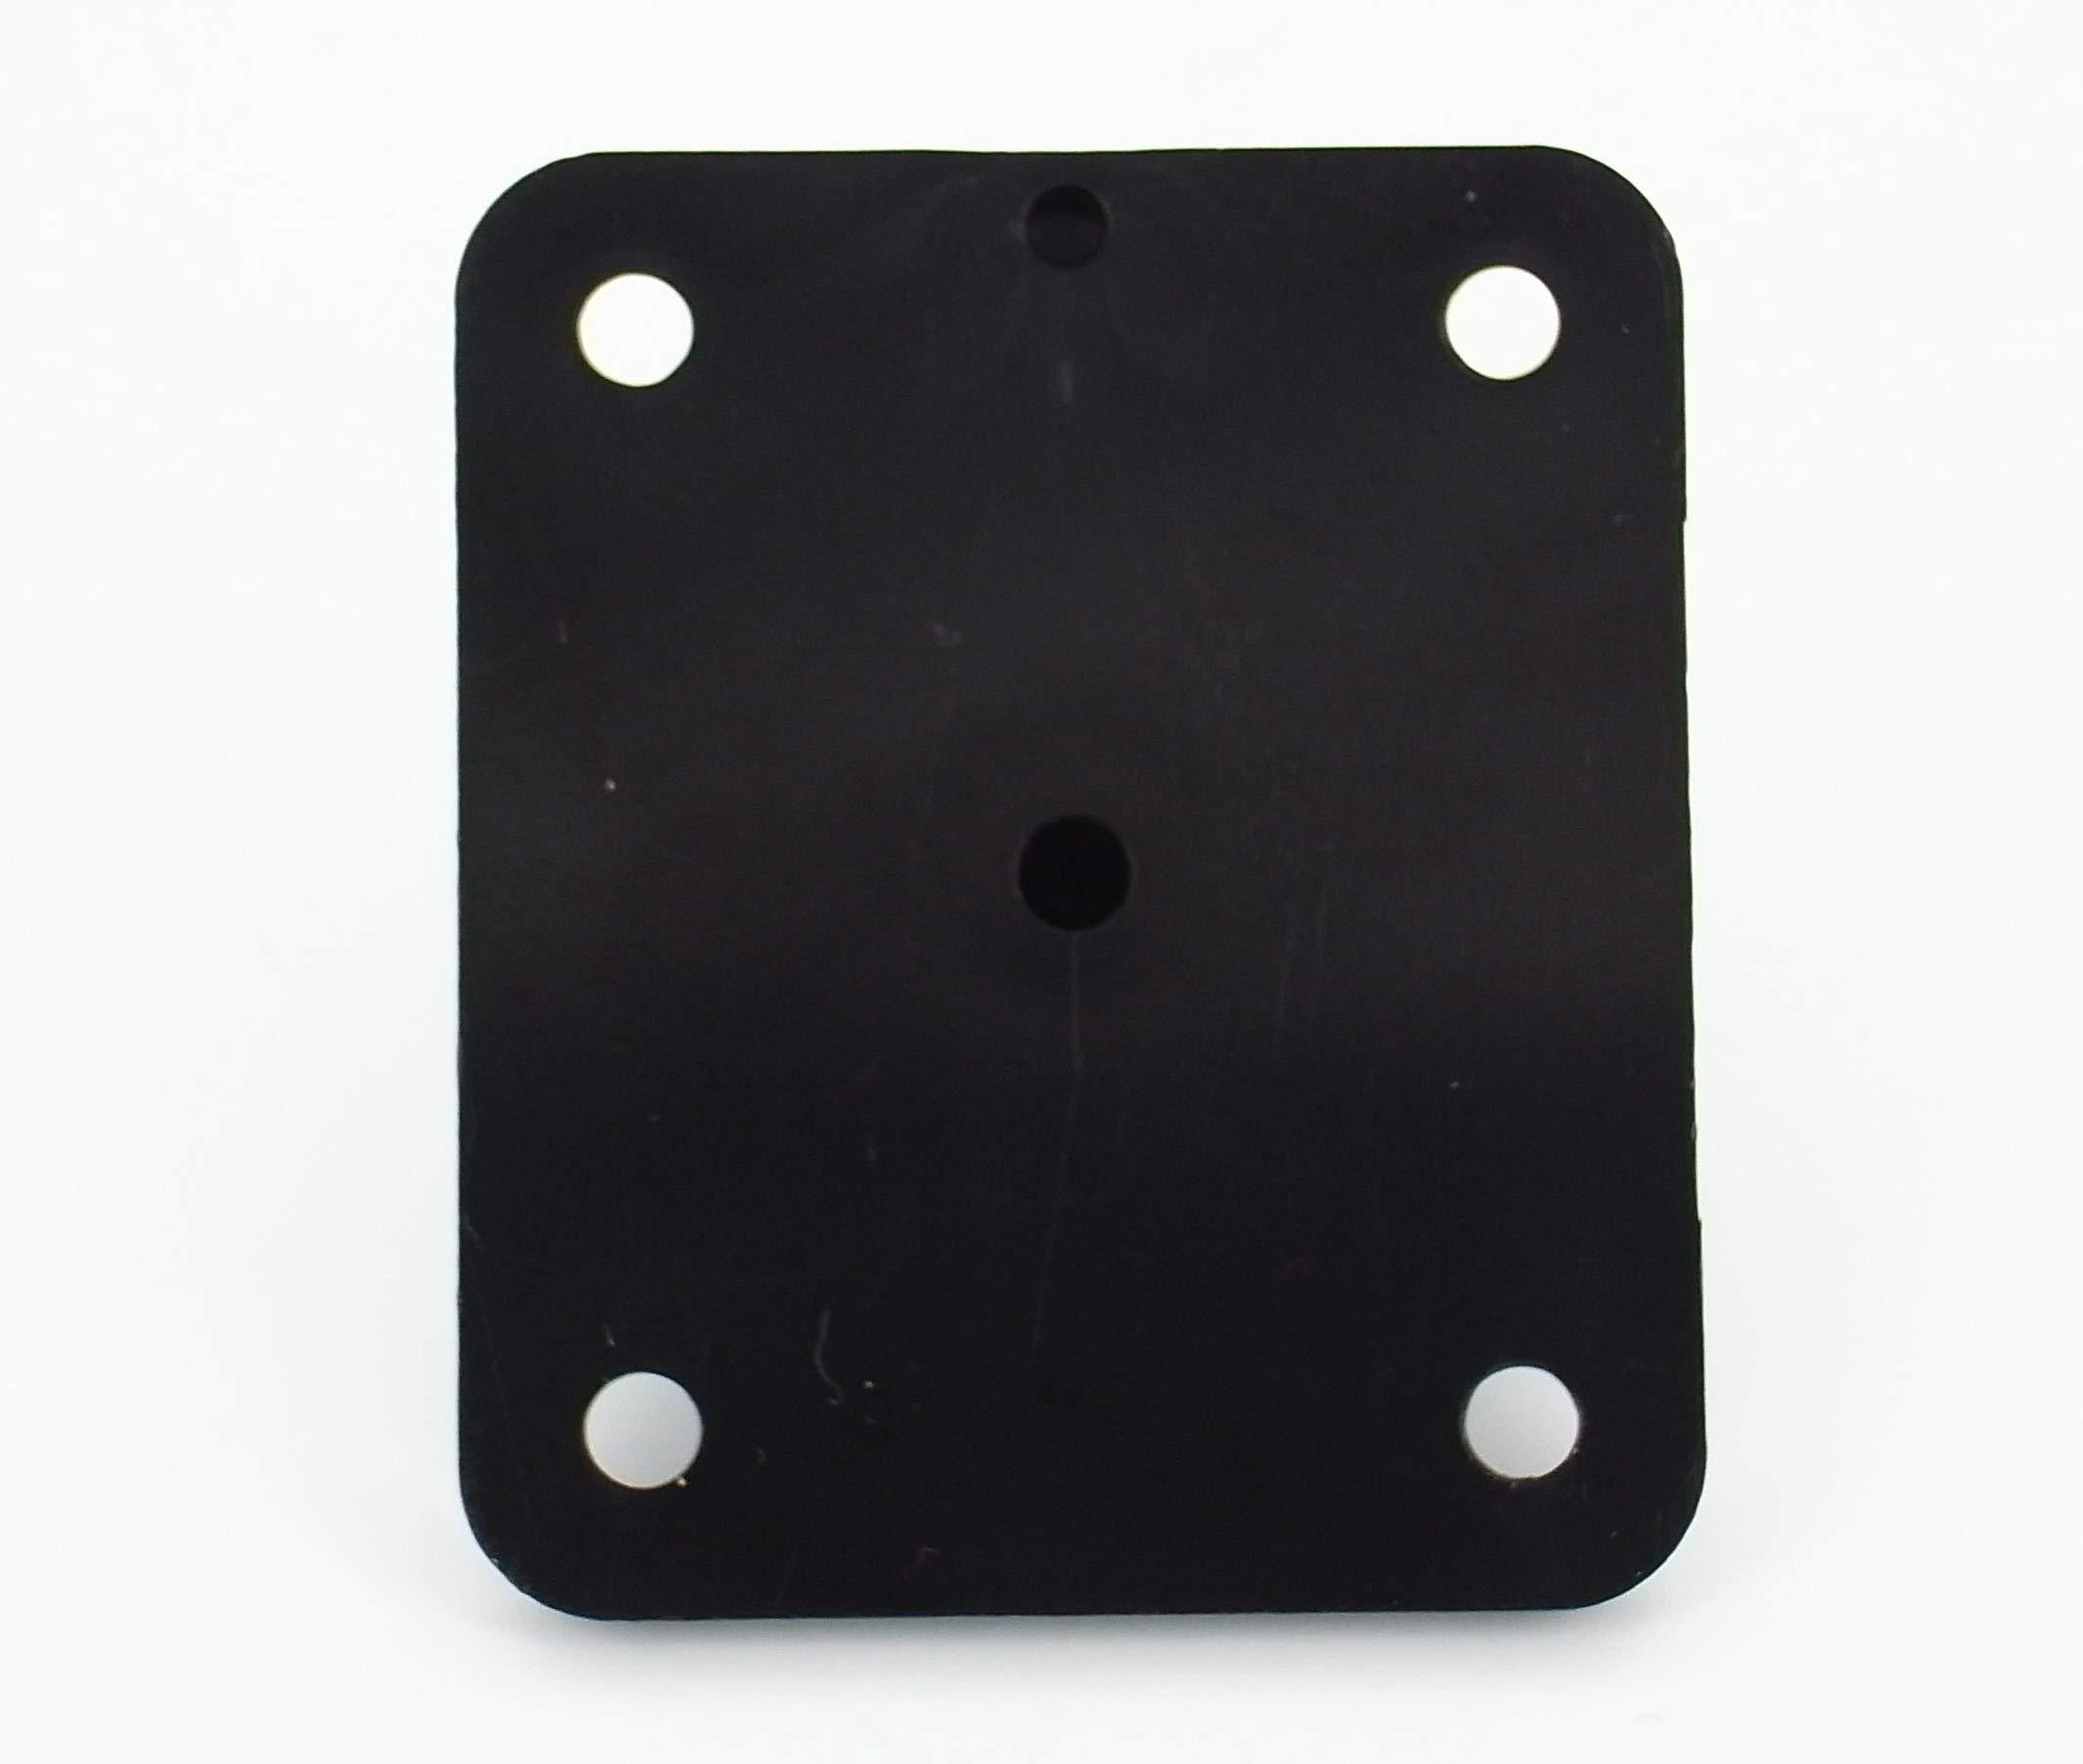 telebox-Navi-Kugel-Halterung-Montage-im-AutoKFZ-kompatibel-fr-Garmin-nviGarmin-Drive